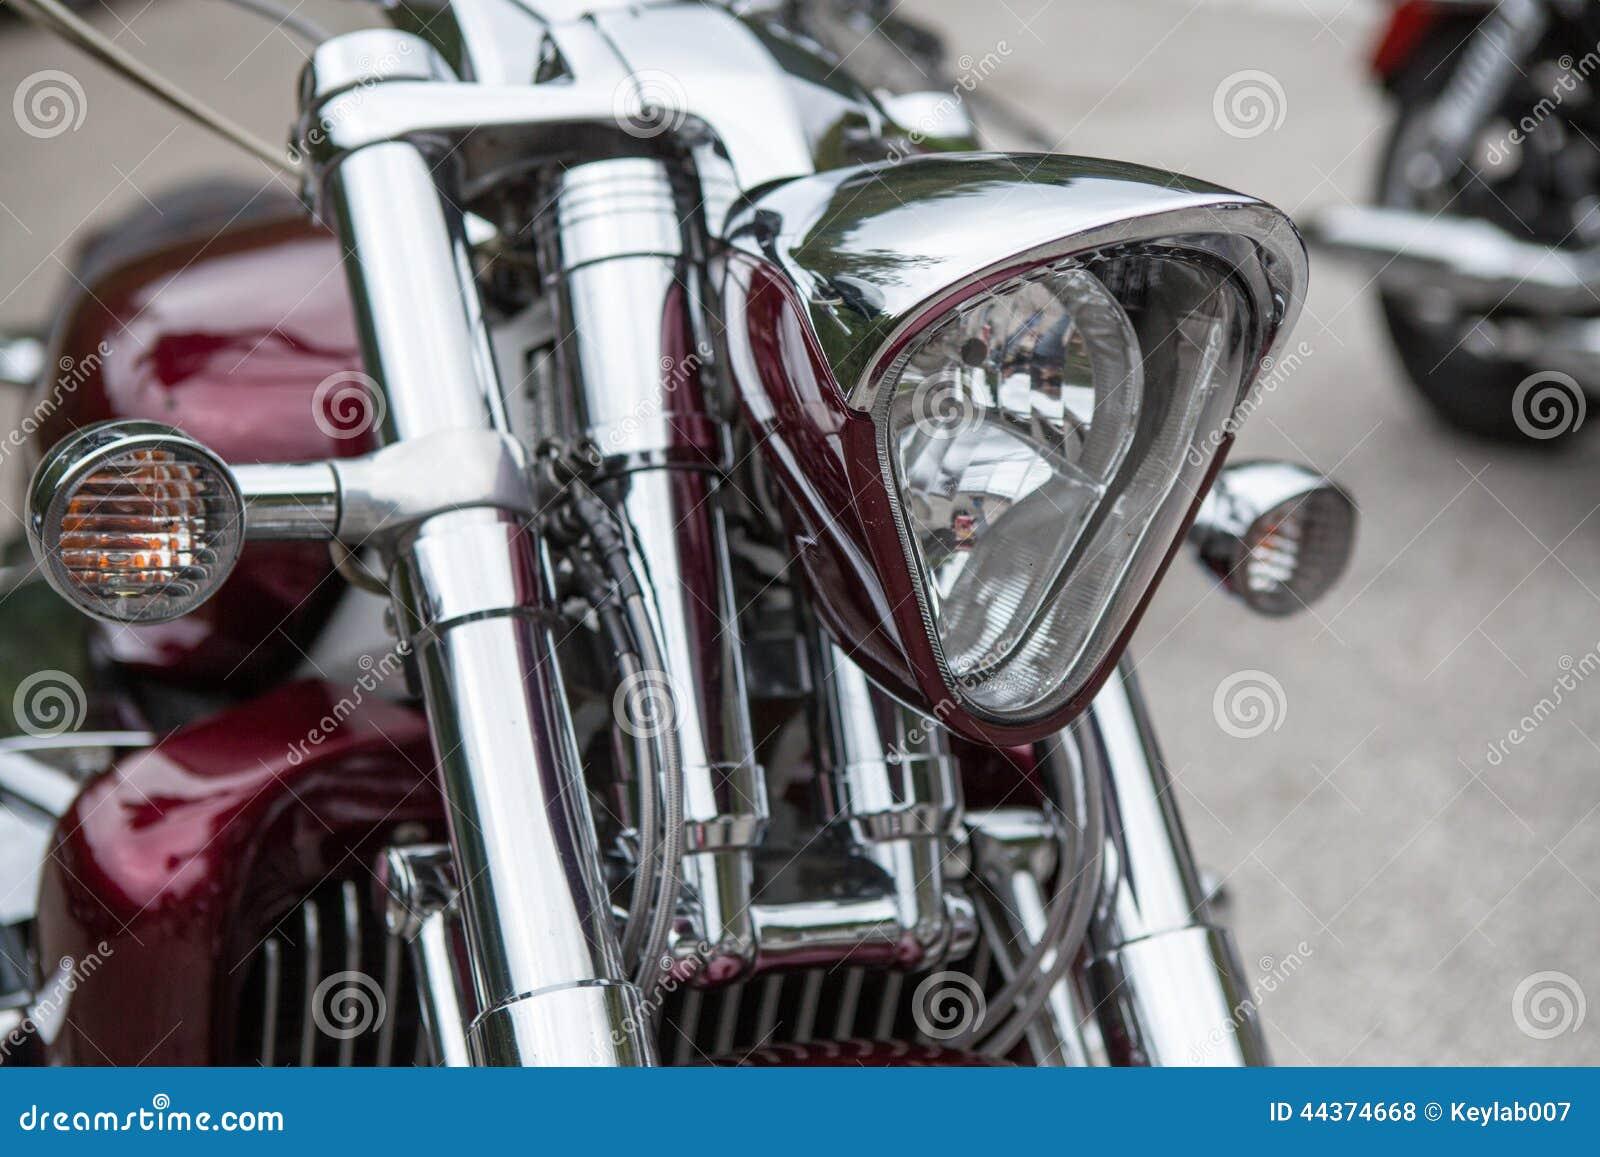 Bici Honda Gold Wing del motore